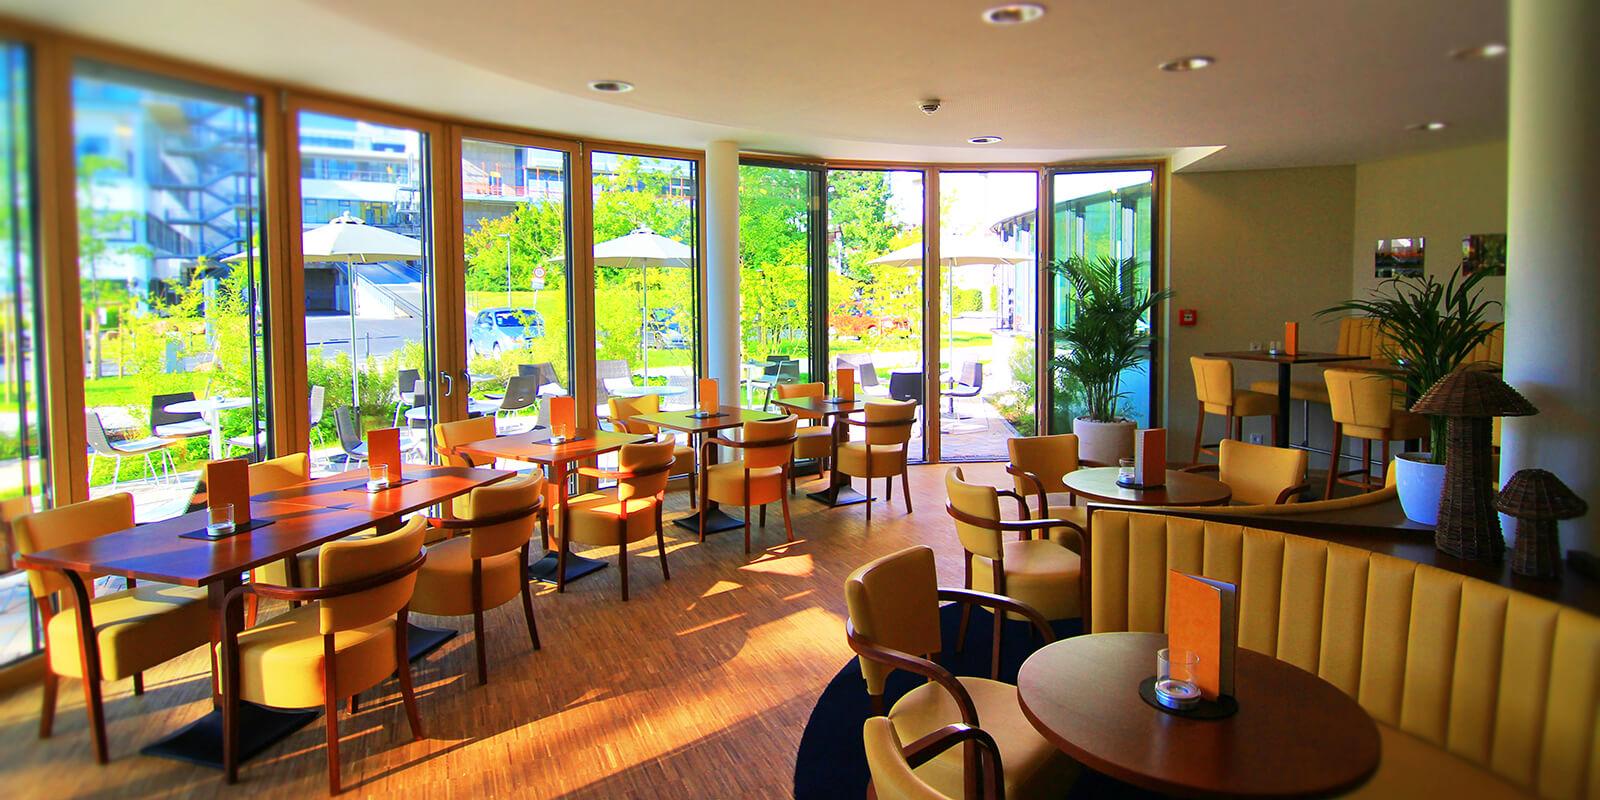 Innenansicht des VILA VITA Café Lahnberge